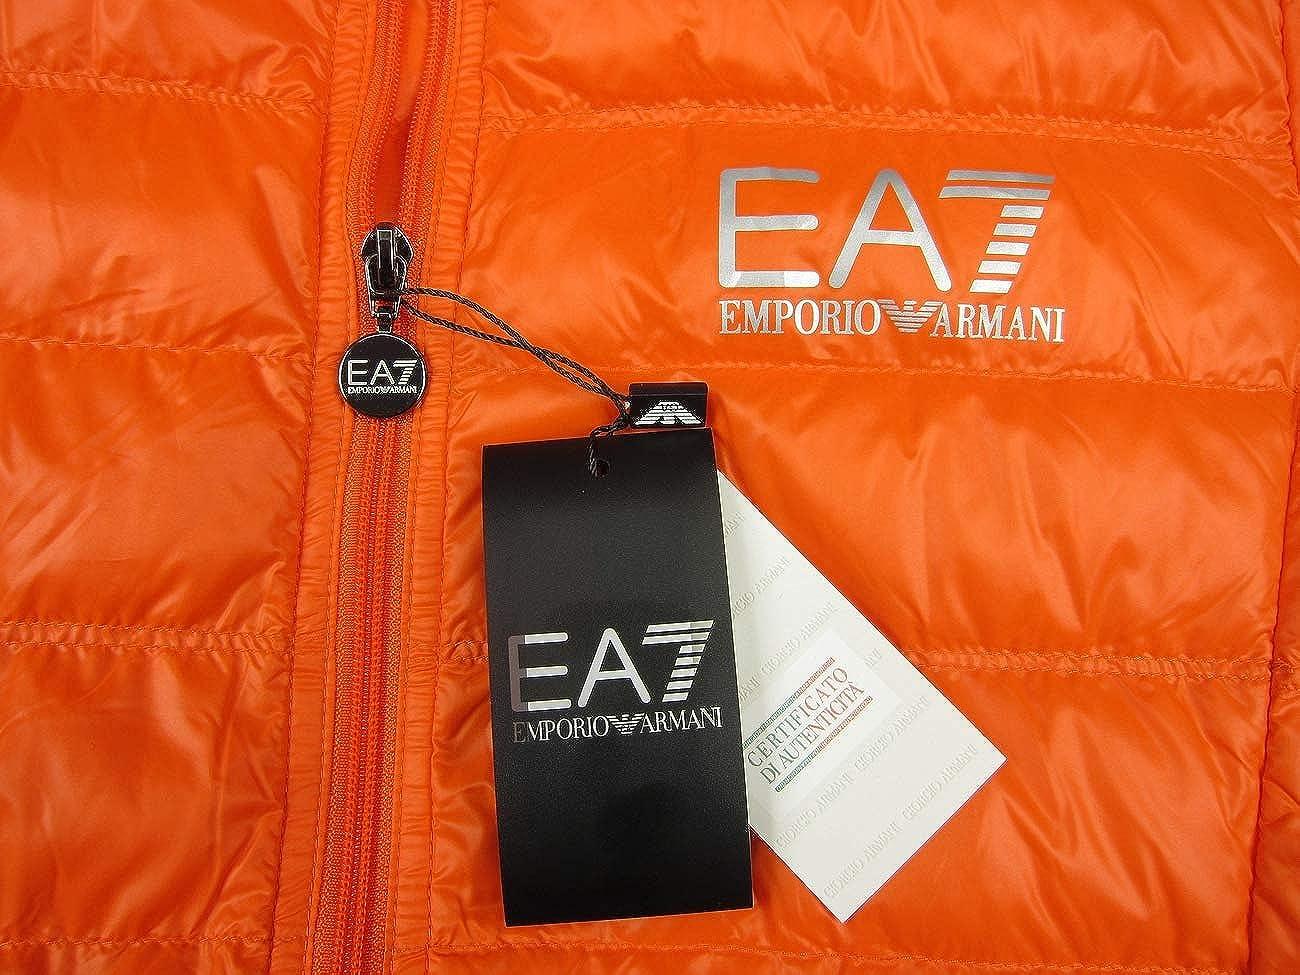 ea3692fde127bf Emporio Armani EA7 Herren Men Daunen Down Leichte Jacke Jacket Orange  (XXL): Amazon.de: Bekleidung